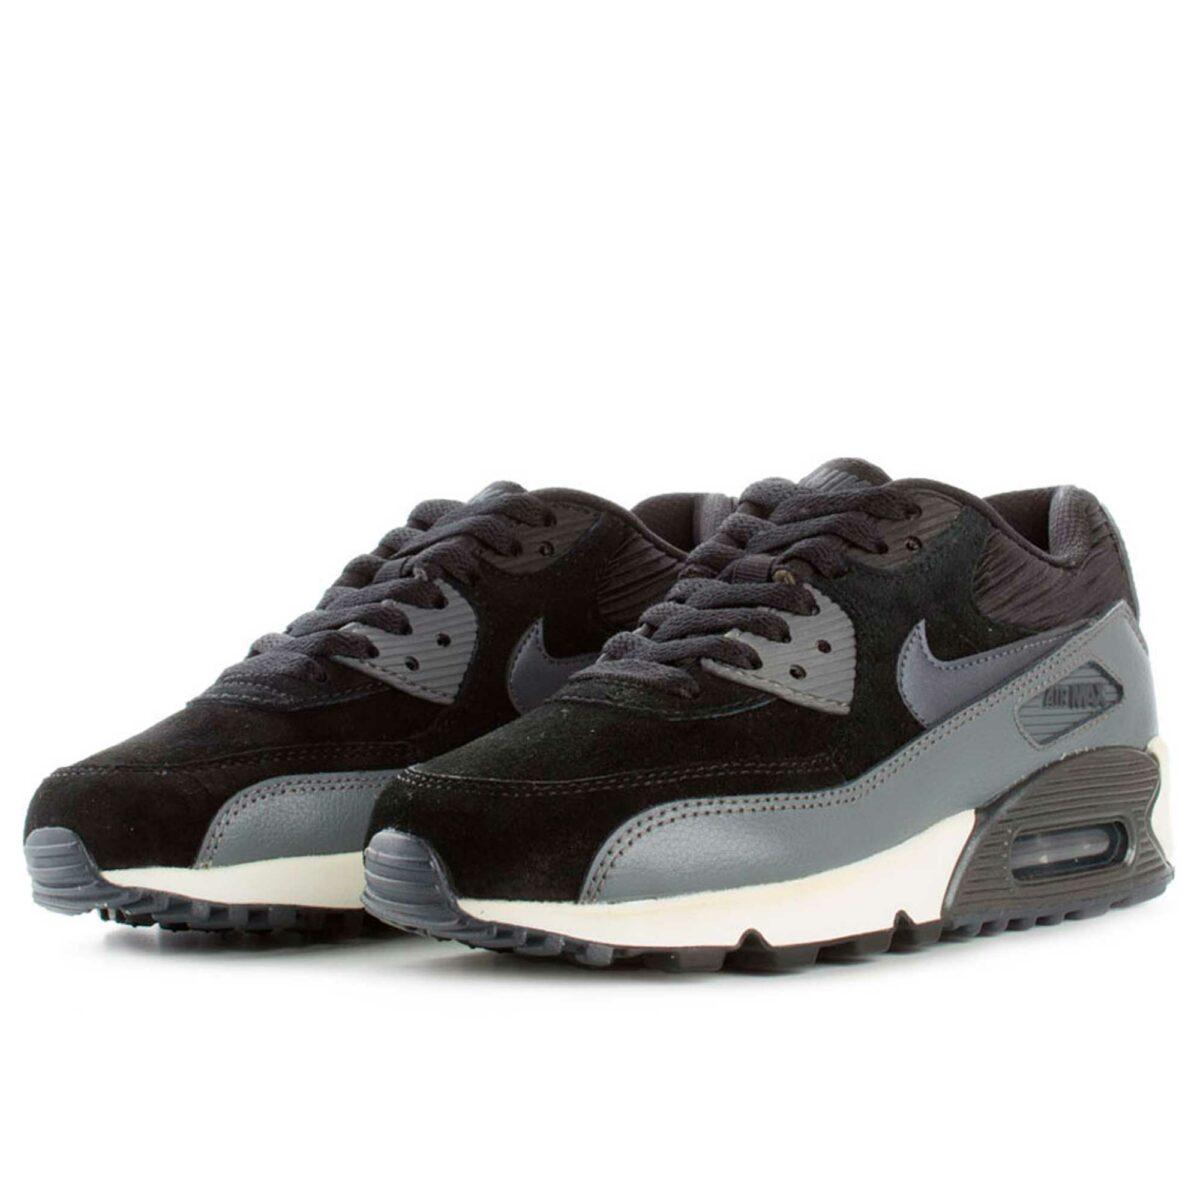 nike air max 90 black grey 768887_001 купить